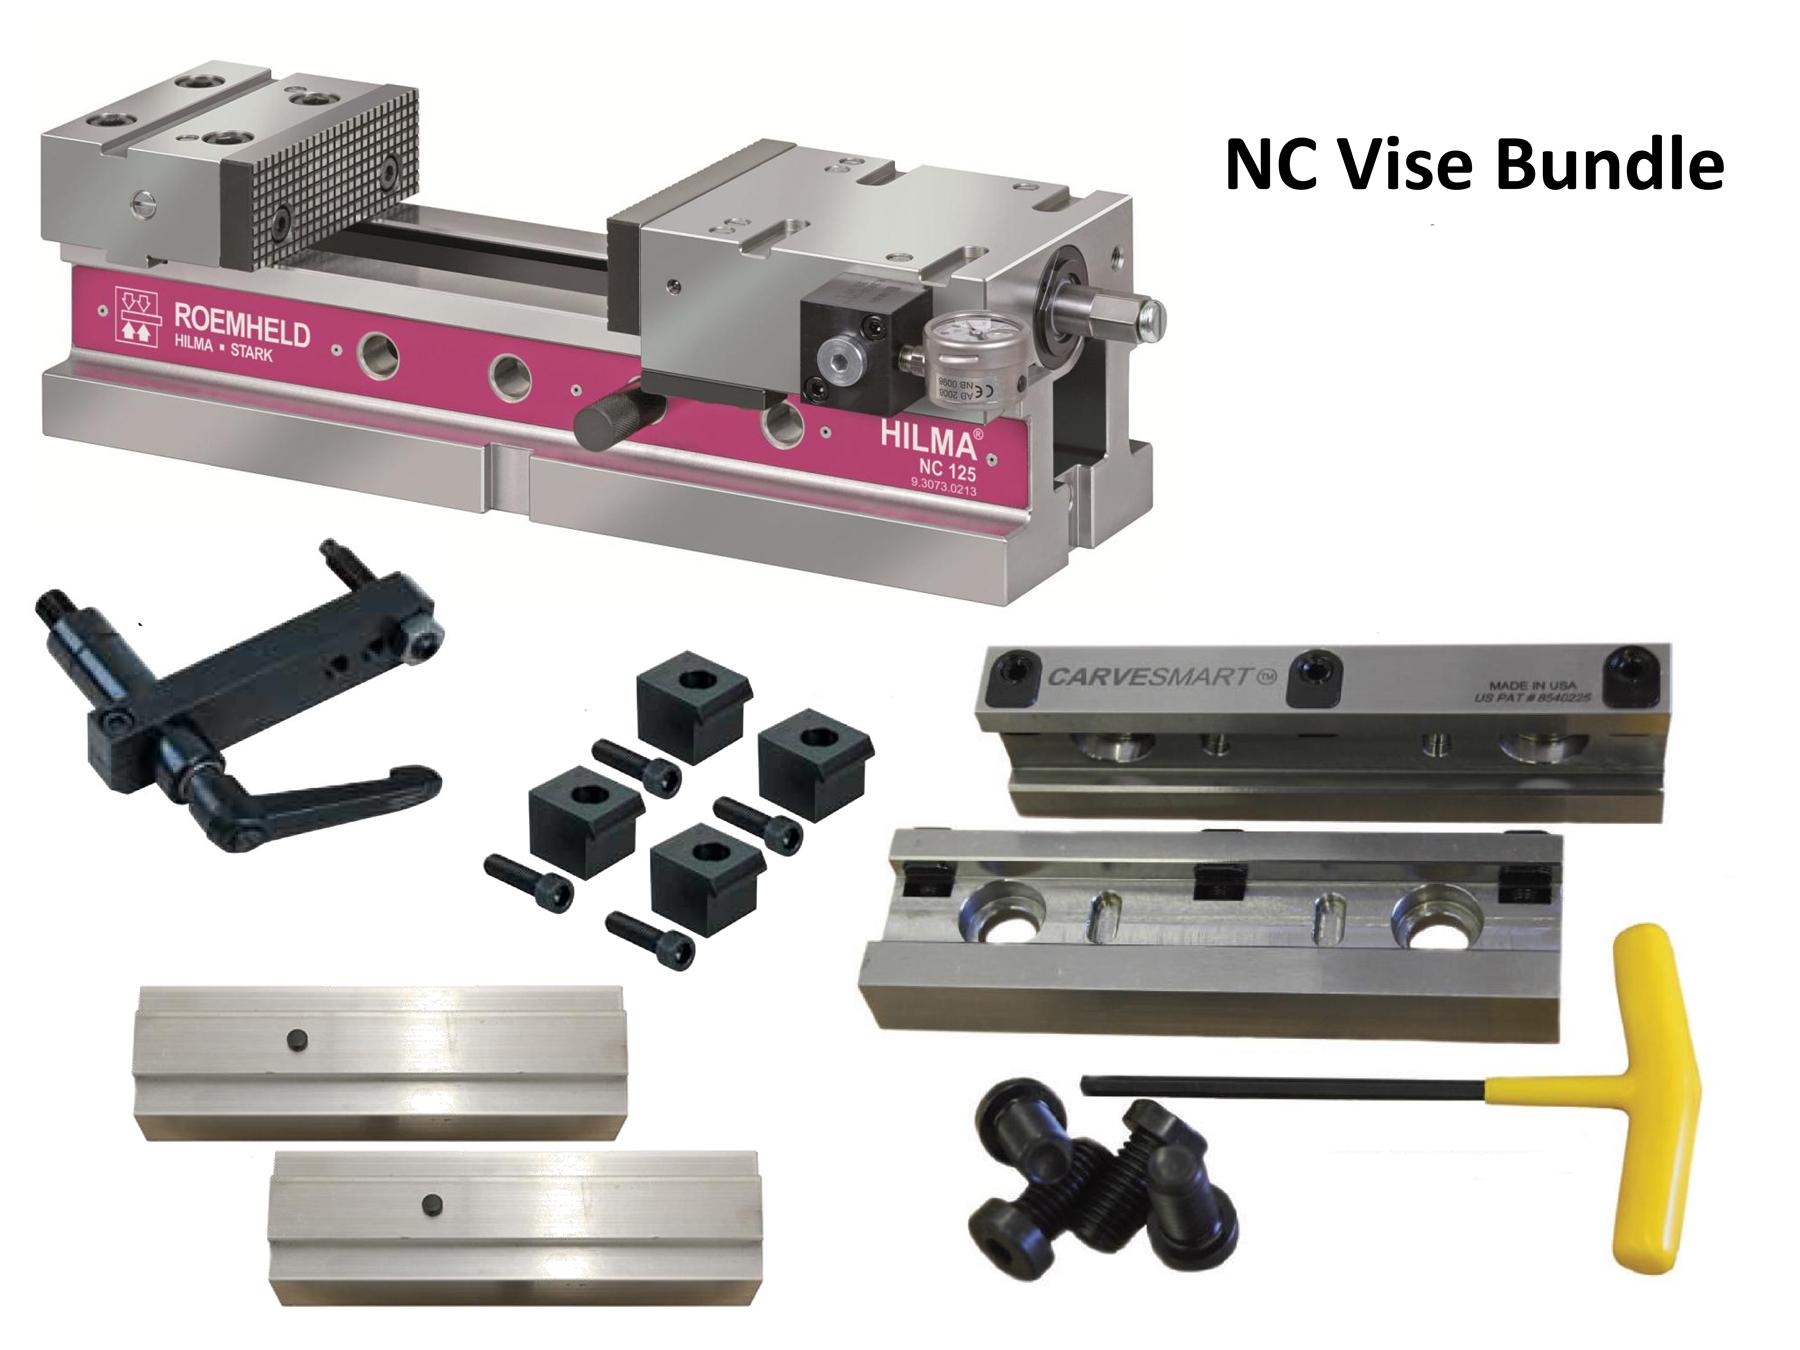 CNC Vise with Precision Quick Change Jaw Set